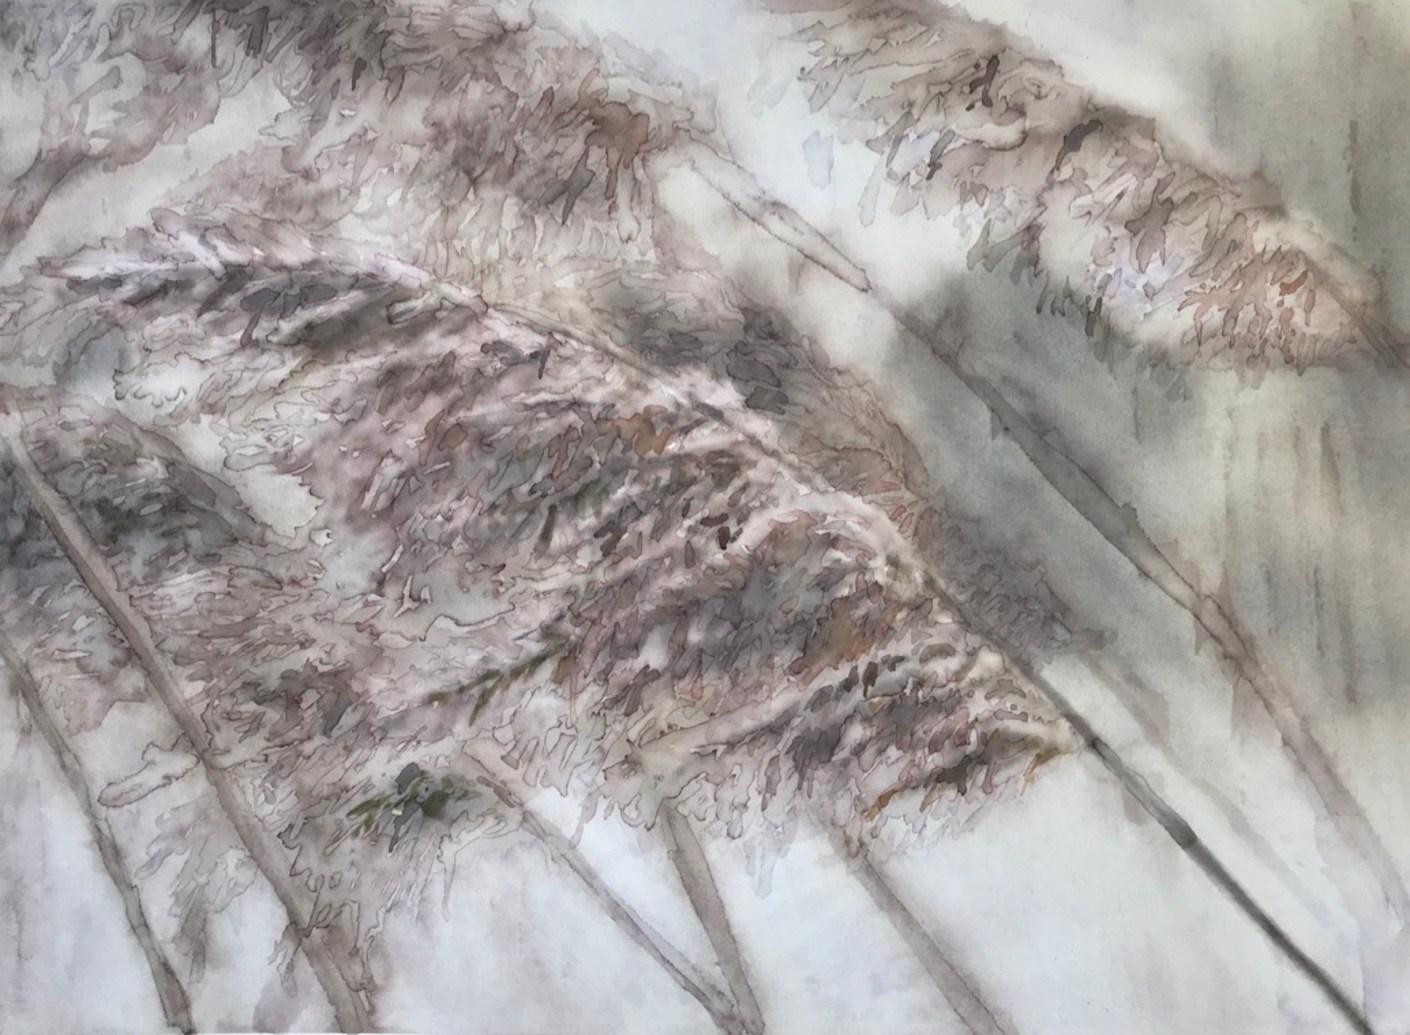 pampluma_aquarela em Hahnemuhle Anniversary Edition 425 gsm_30x40cm_Edna Carla Stradioto_2019